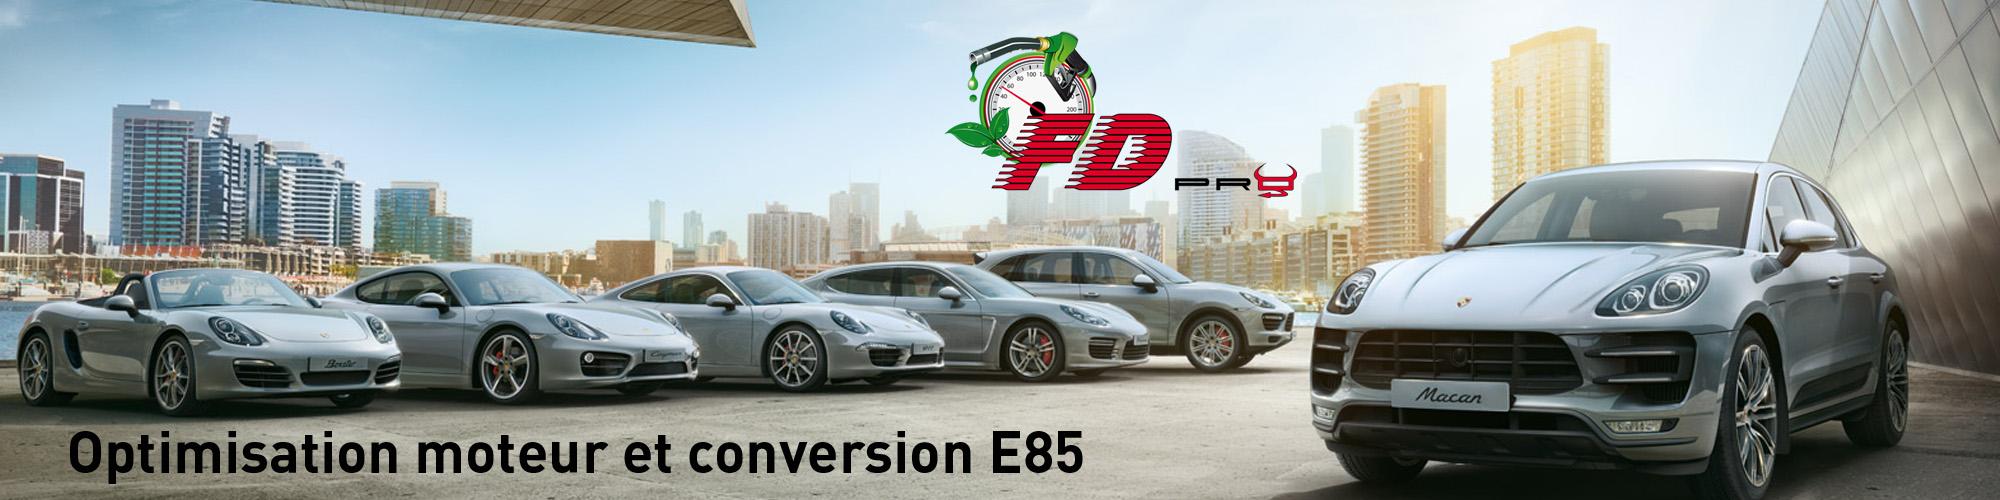 FD PERFORMANCE : Optimisation moteur